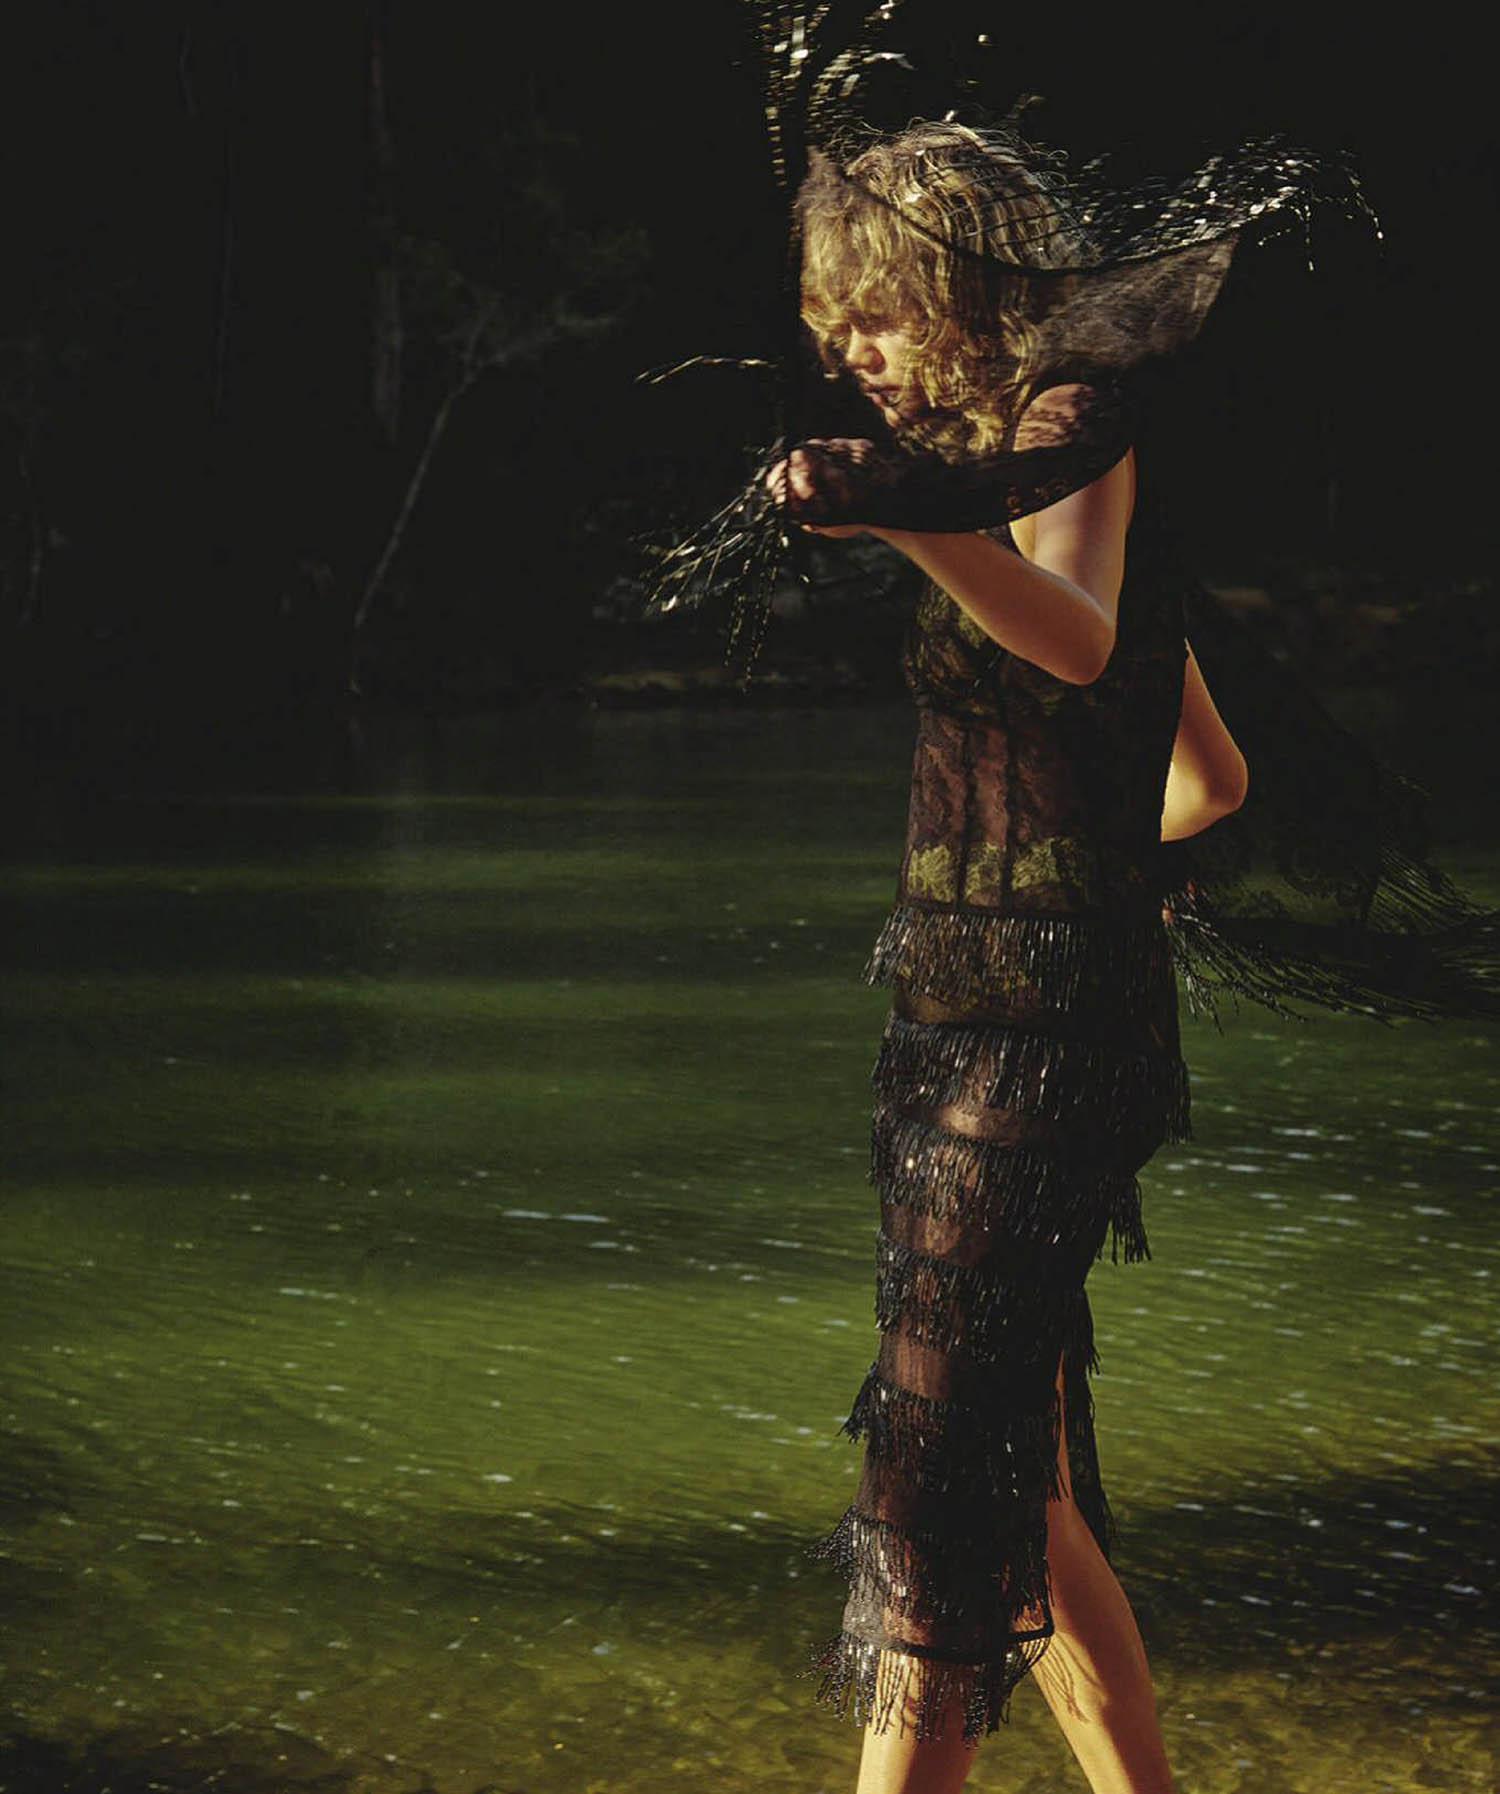 Billie-Jean Hamlet by Saskia Wilson for Vogue Australia November 2020